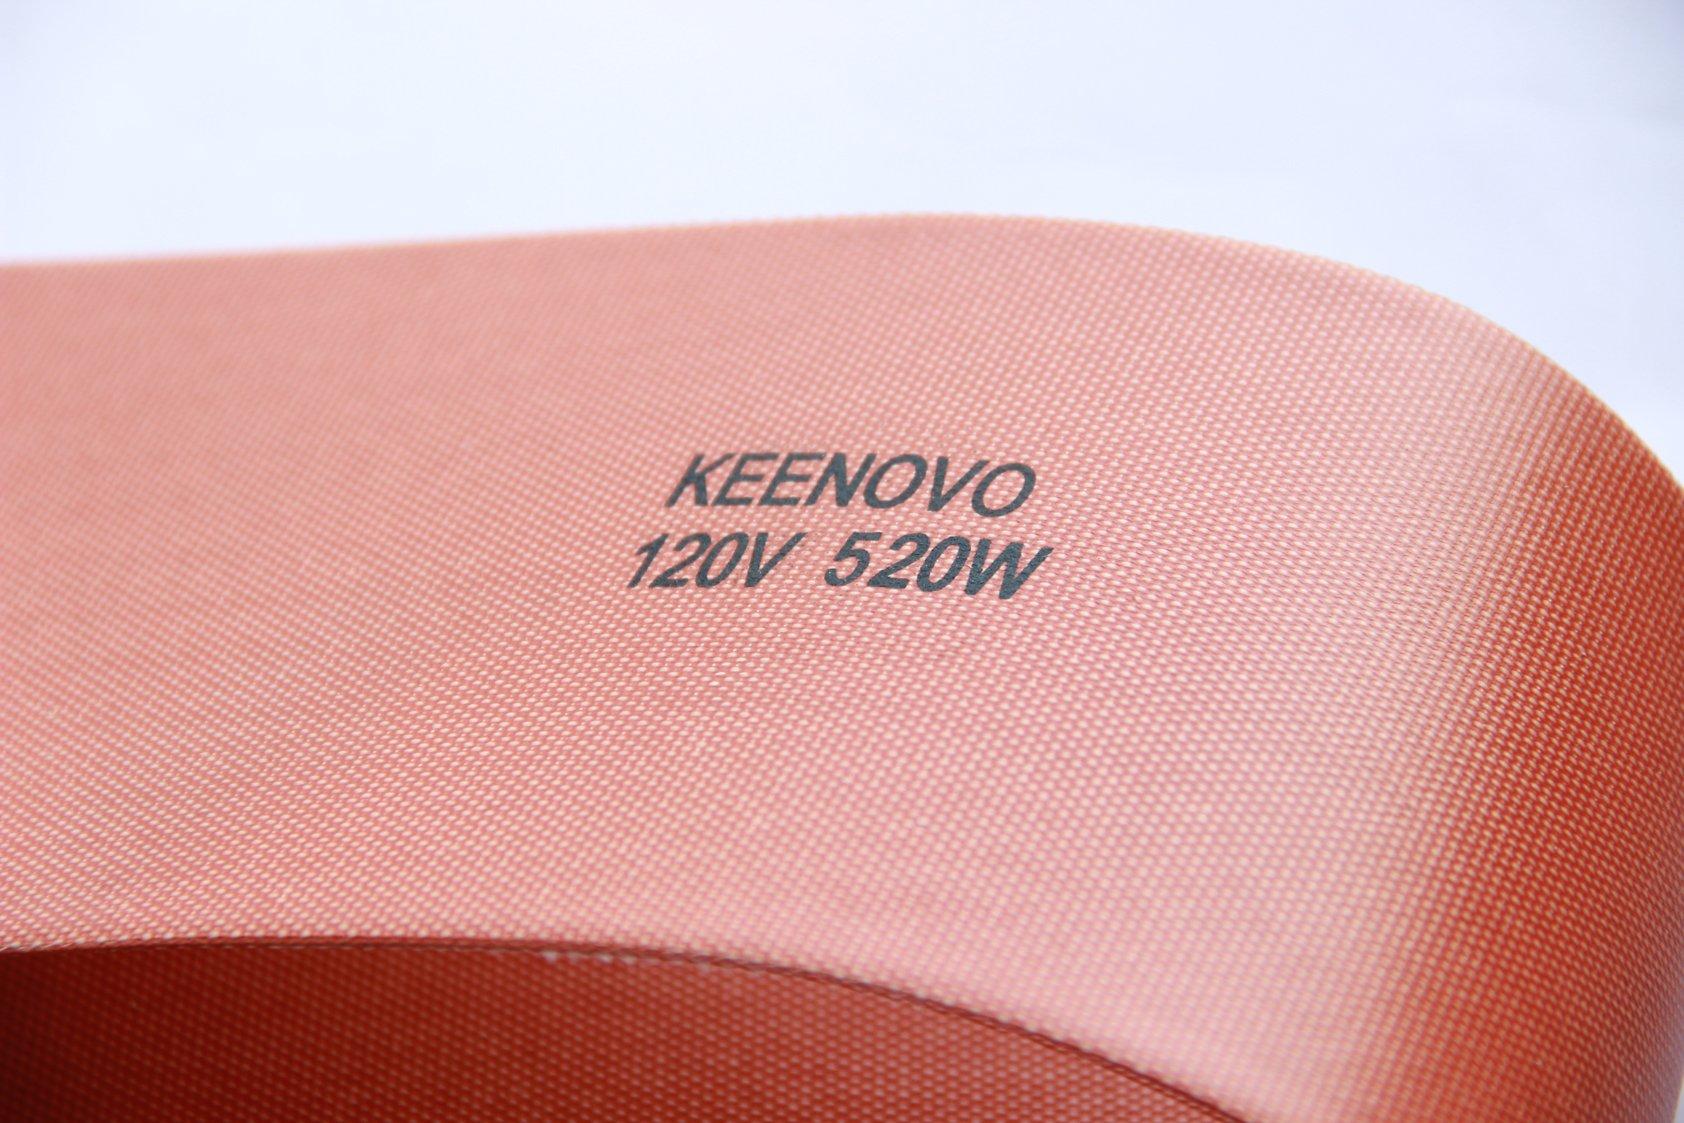 5'' X 24'', 520W@120V, KEENOVO Silicone Heater Blanket for Musical Instrument Press Mold Heat Blanket, Ukulele Side Bending Blanket, Custom Design Welcome